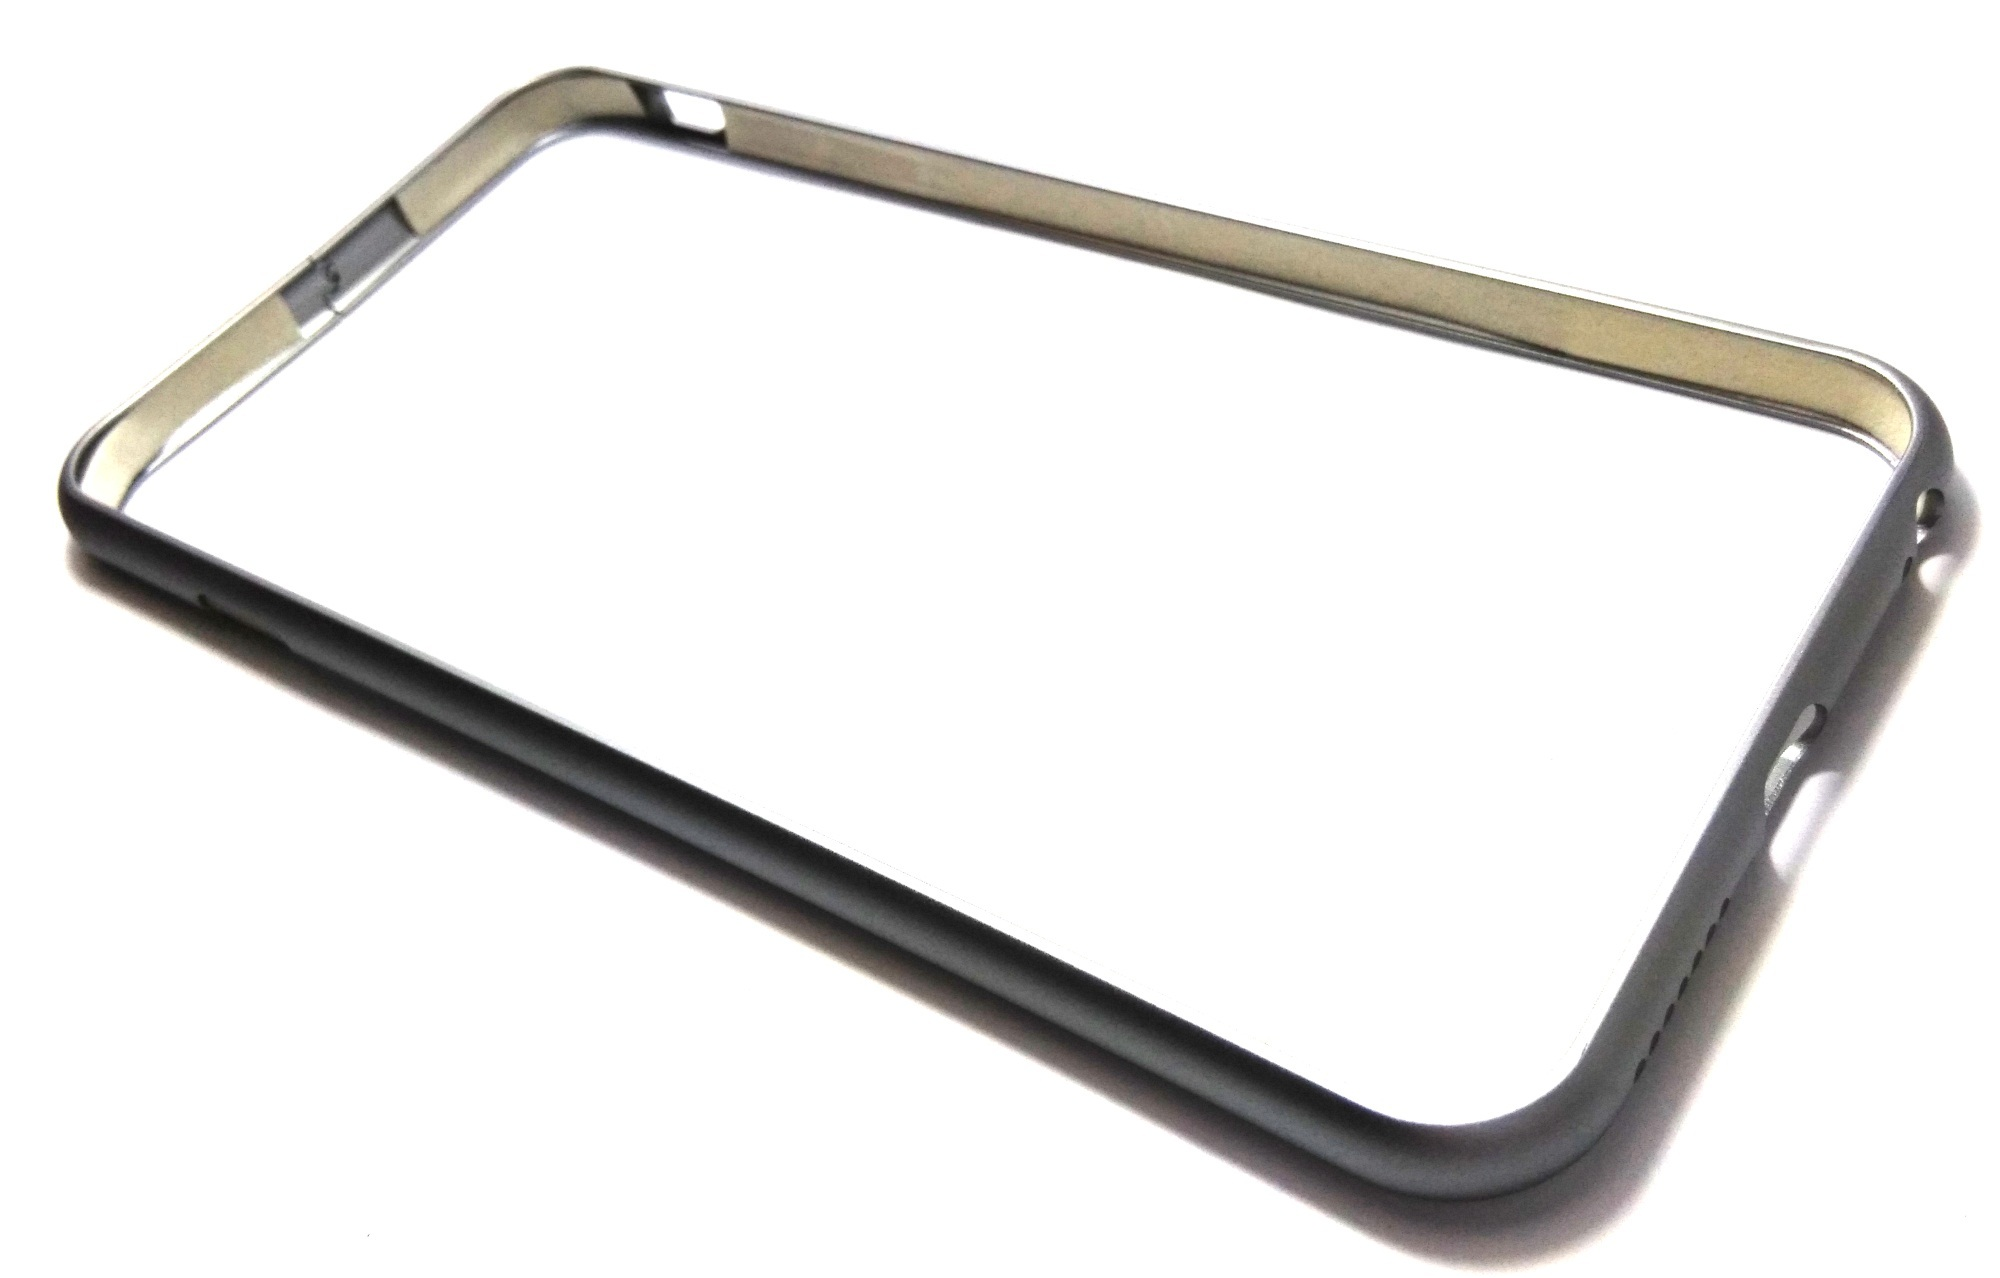 "Sleek Metal Bumper for 5.5"" iPhone 6 Plus/6s Plus (Dark Grey)"